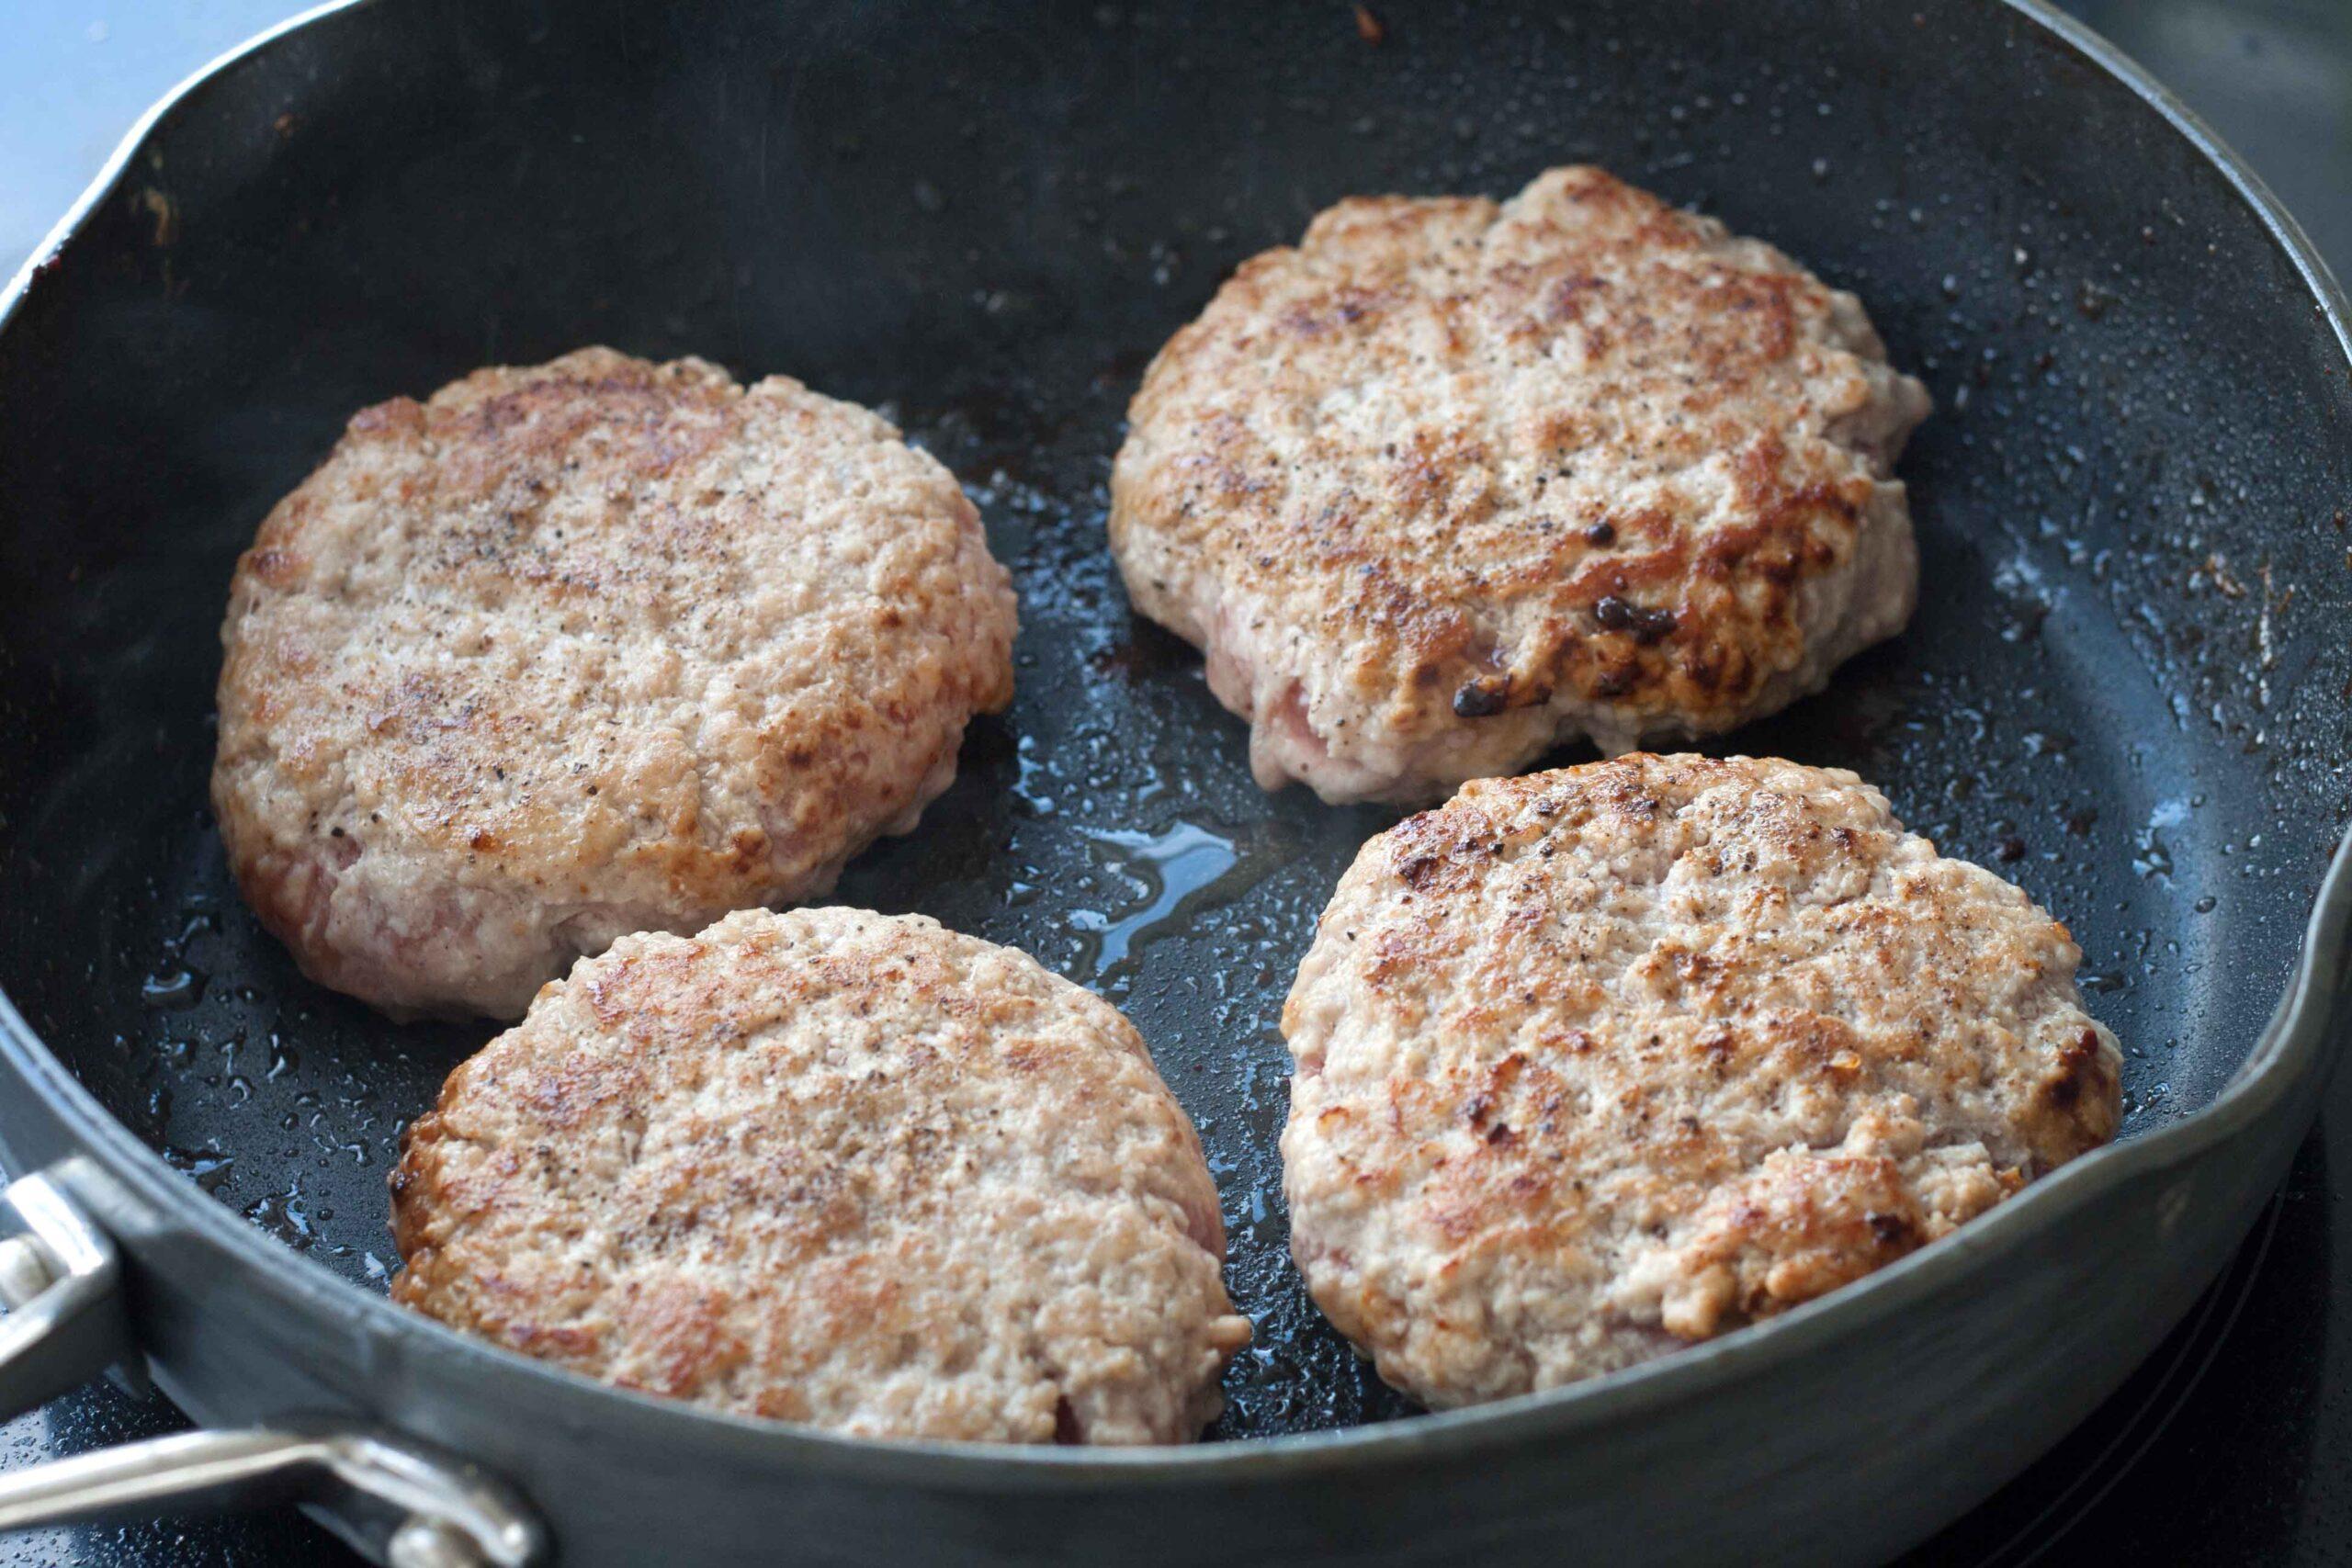 Recipe for Hawaii Pork Patties